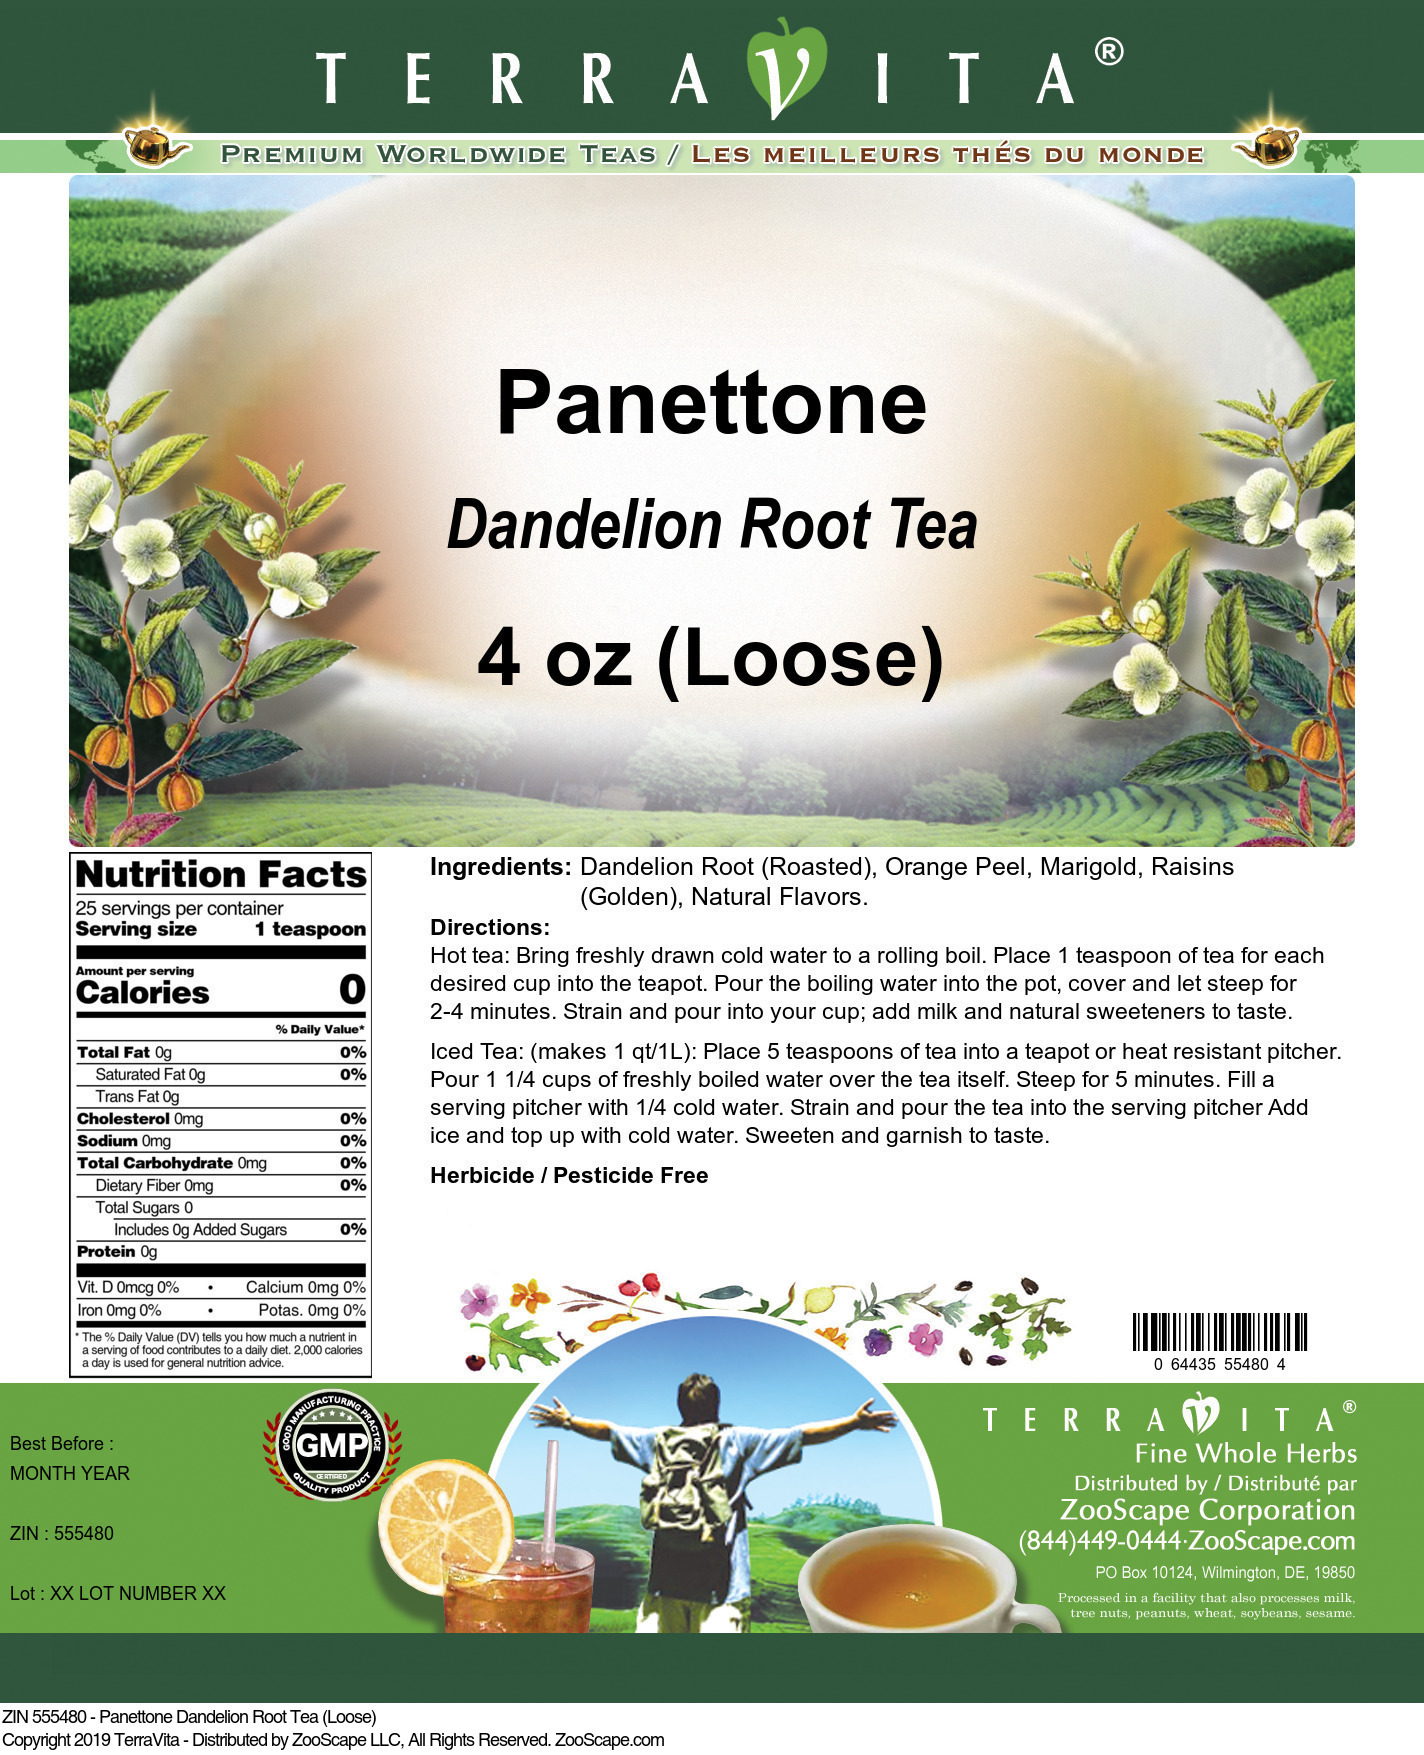 Panettone Dandelion Root Tea (Loose)